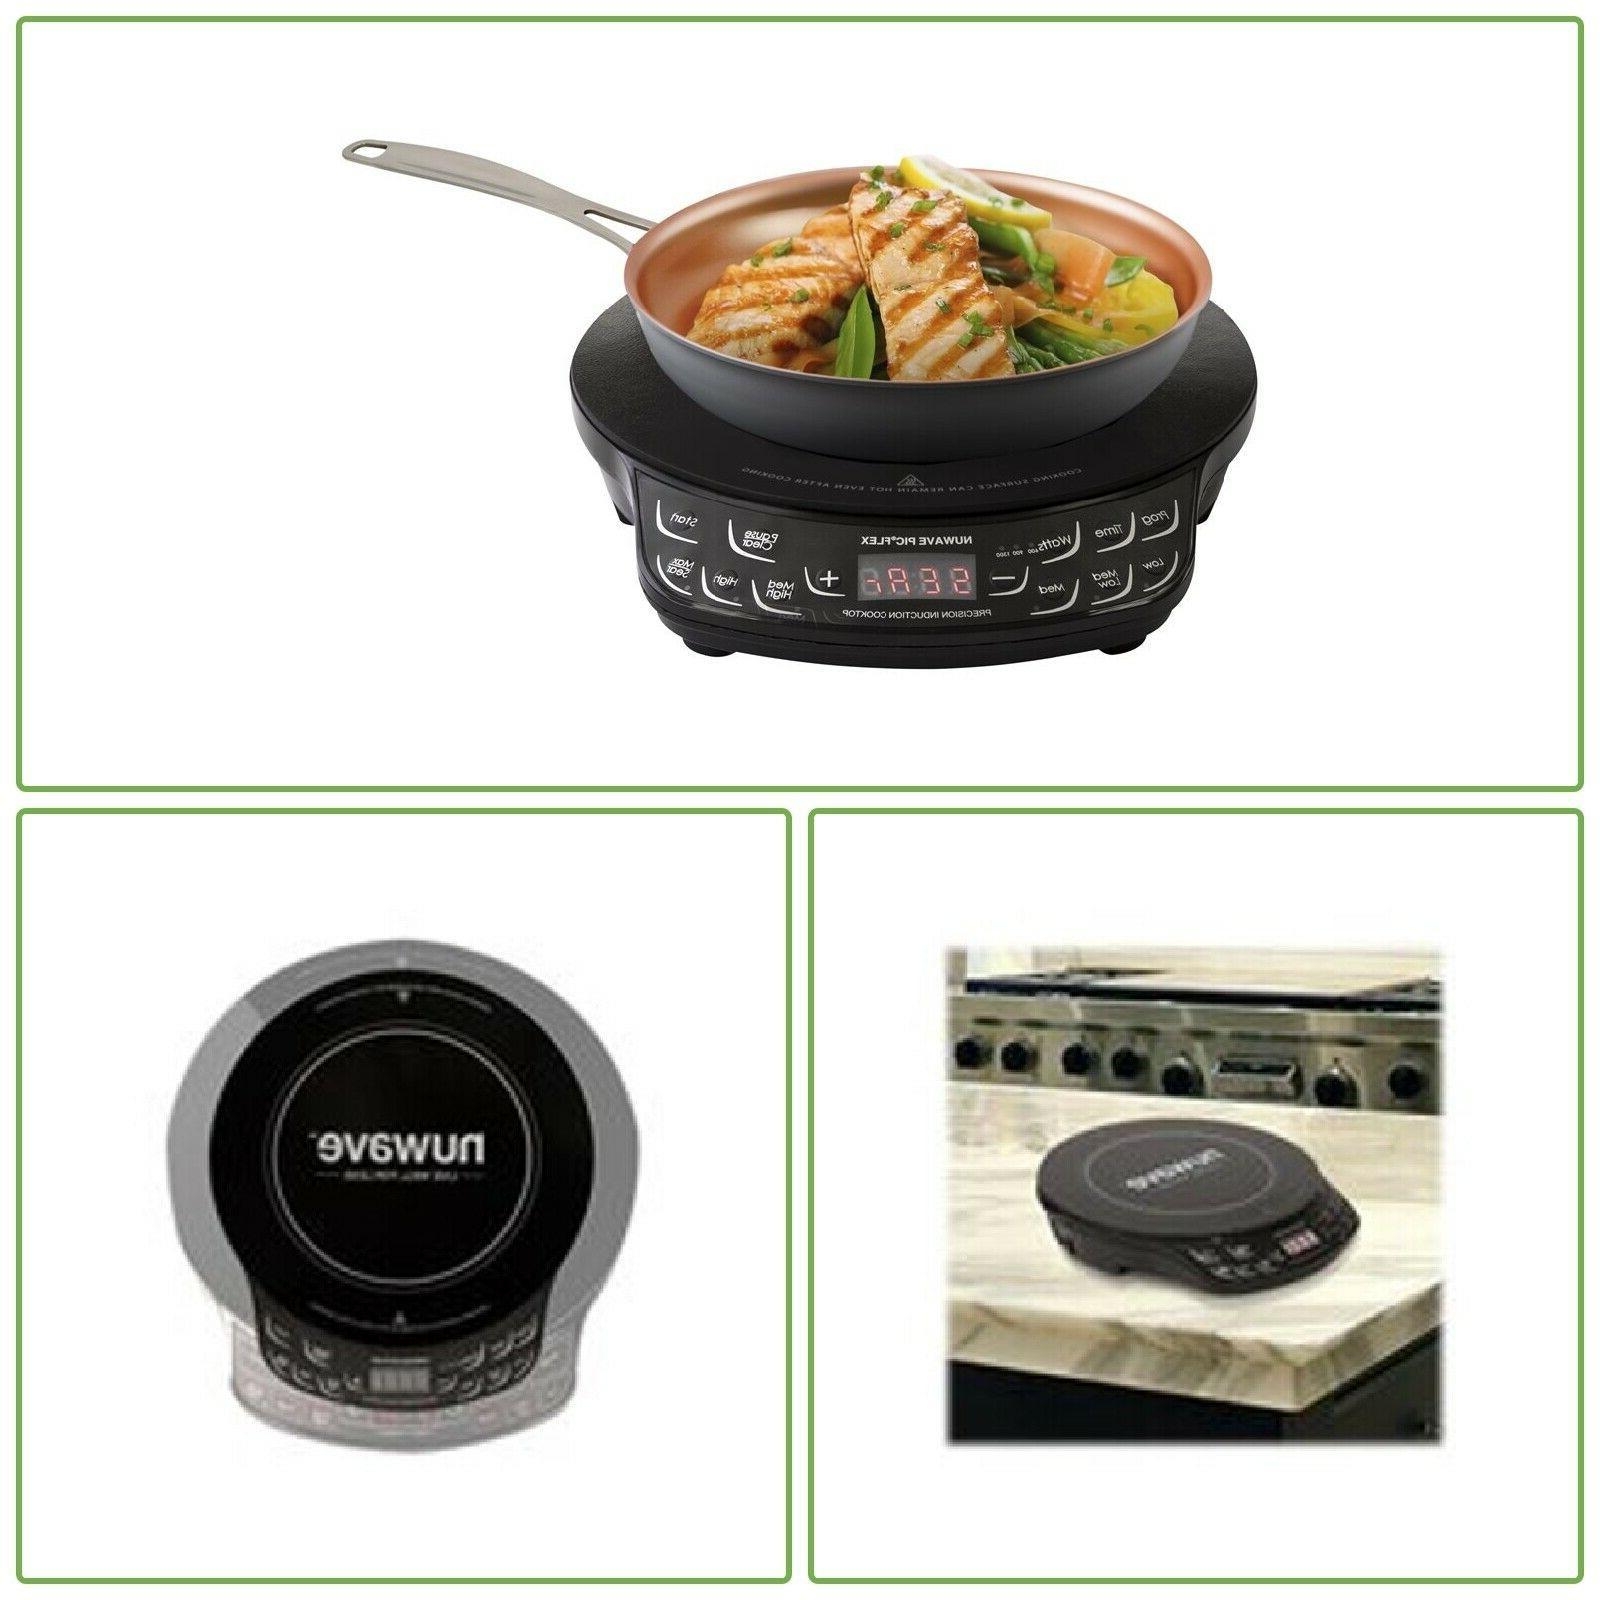 pic flex precision induction cooktop